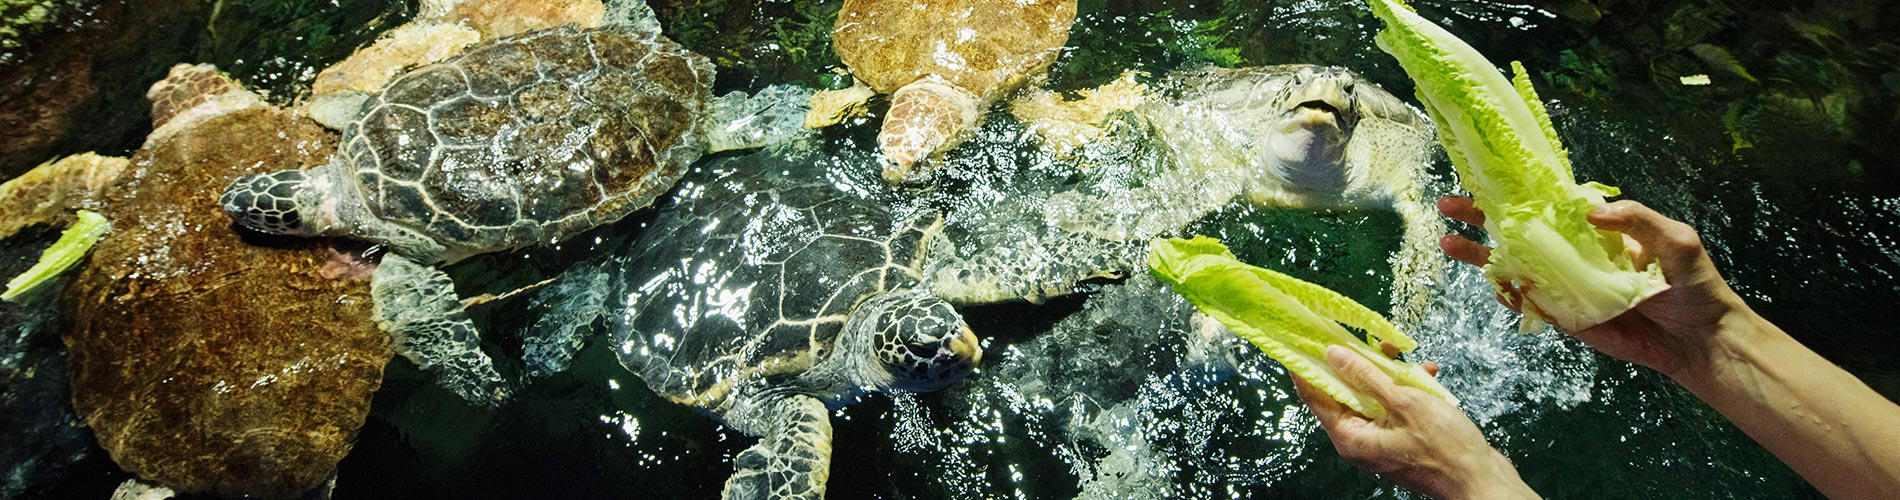 Watch Sea Turtles feed at SeaWorld San Diego